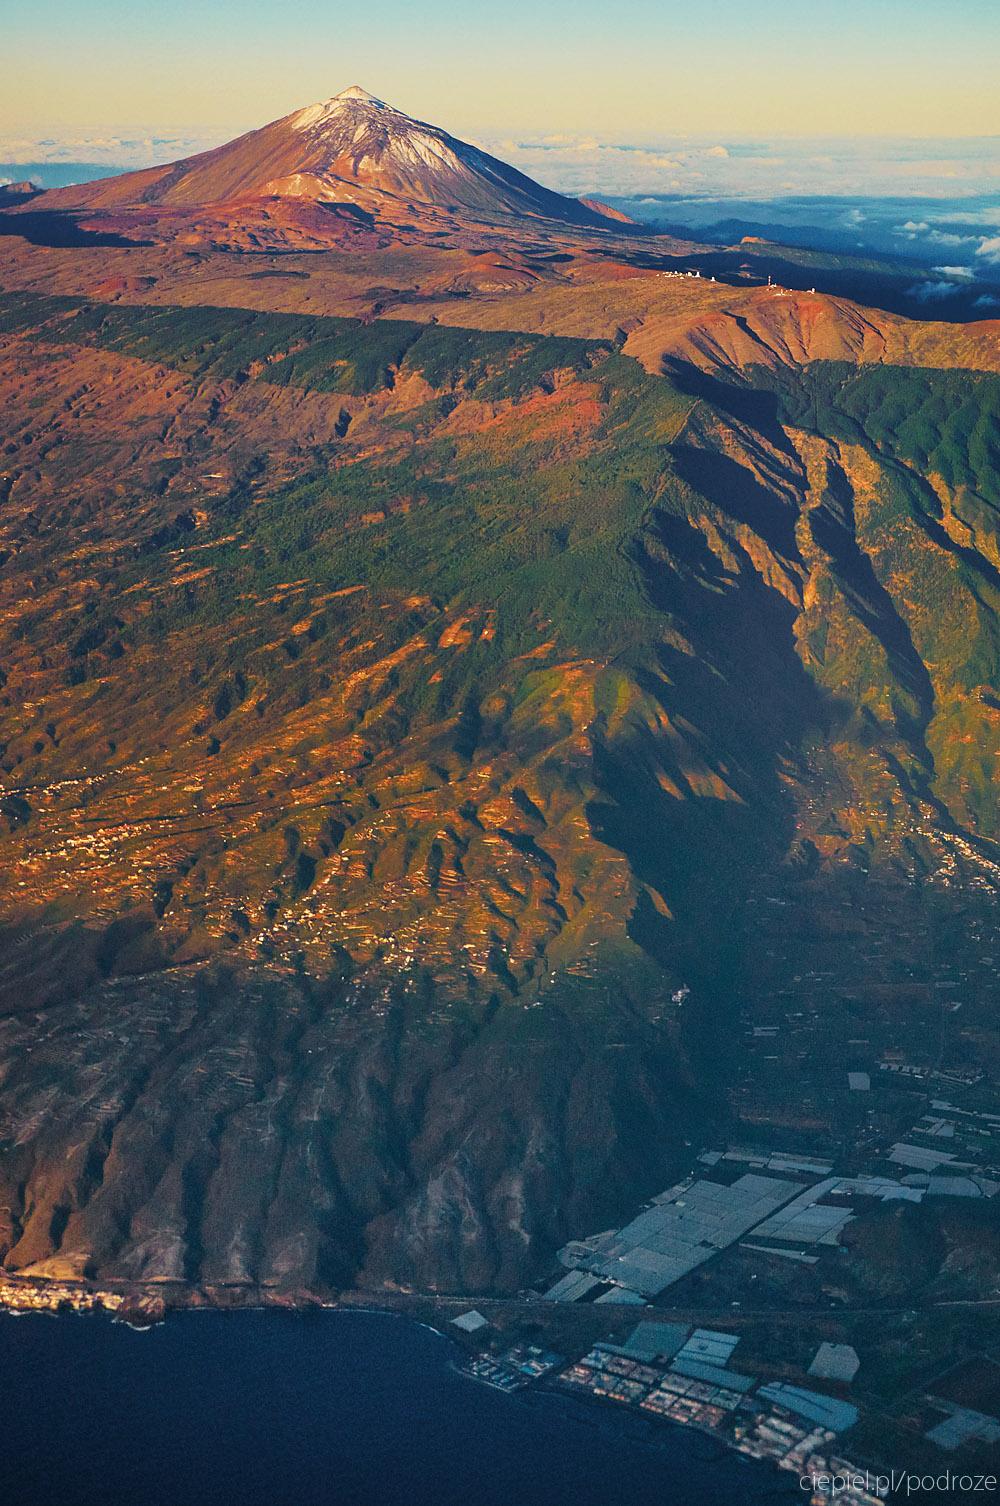 DSC 0544 1 Teide, bliskie spotkanie z wulkanem.